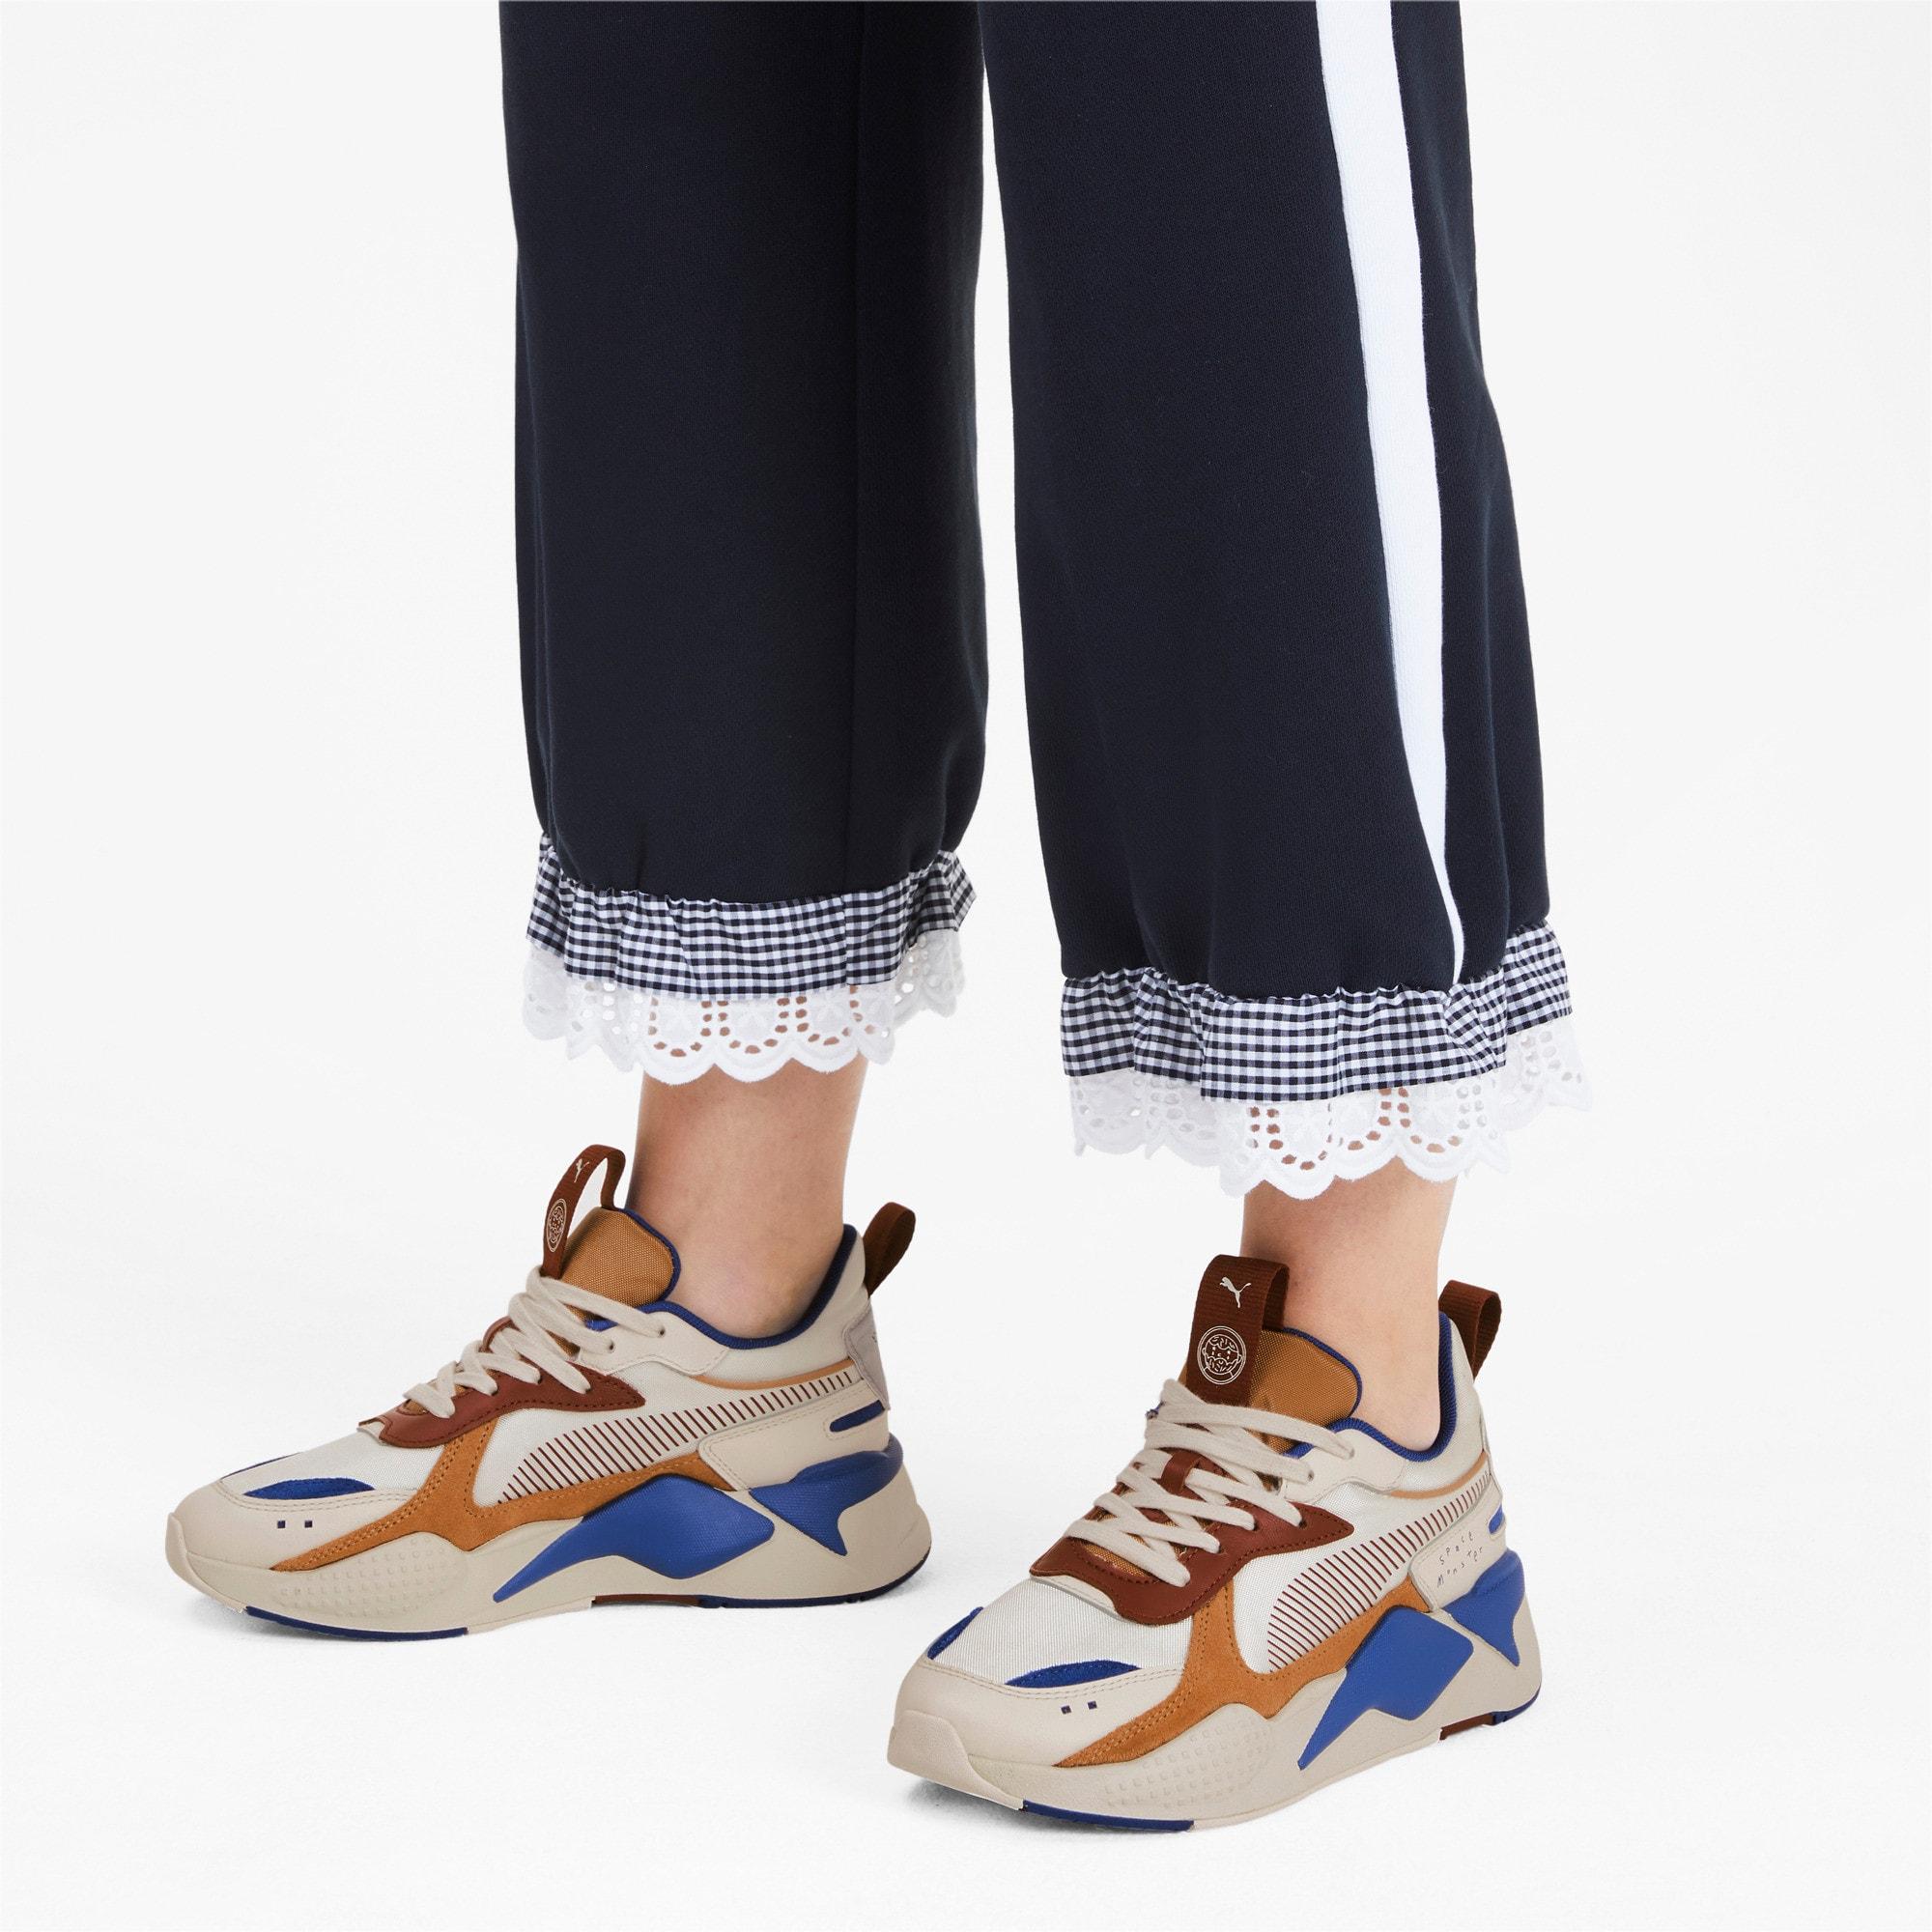 Miniatura 2 de Zapatos deportivos PUMA x TYAKASHA RS-X, Whisper White-Fired Brick, mediano